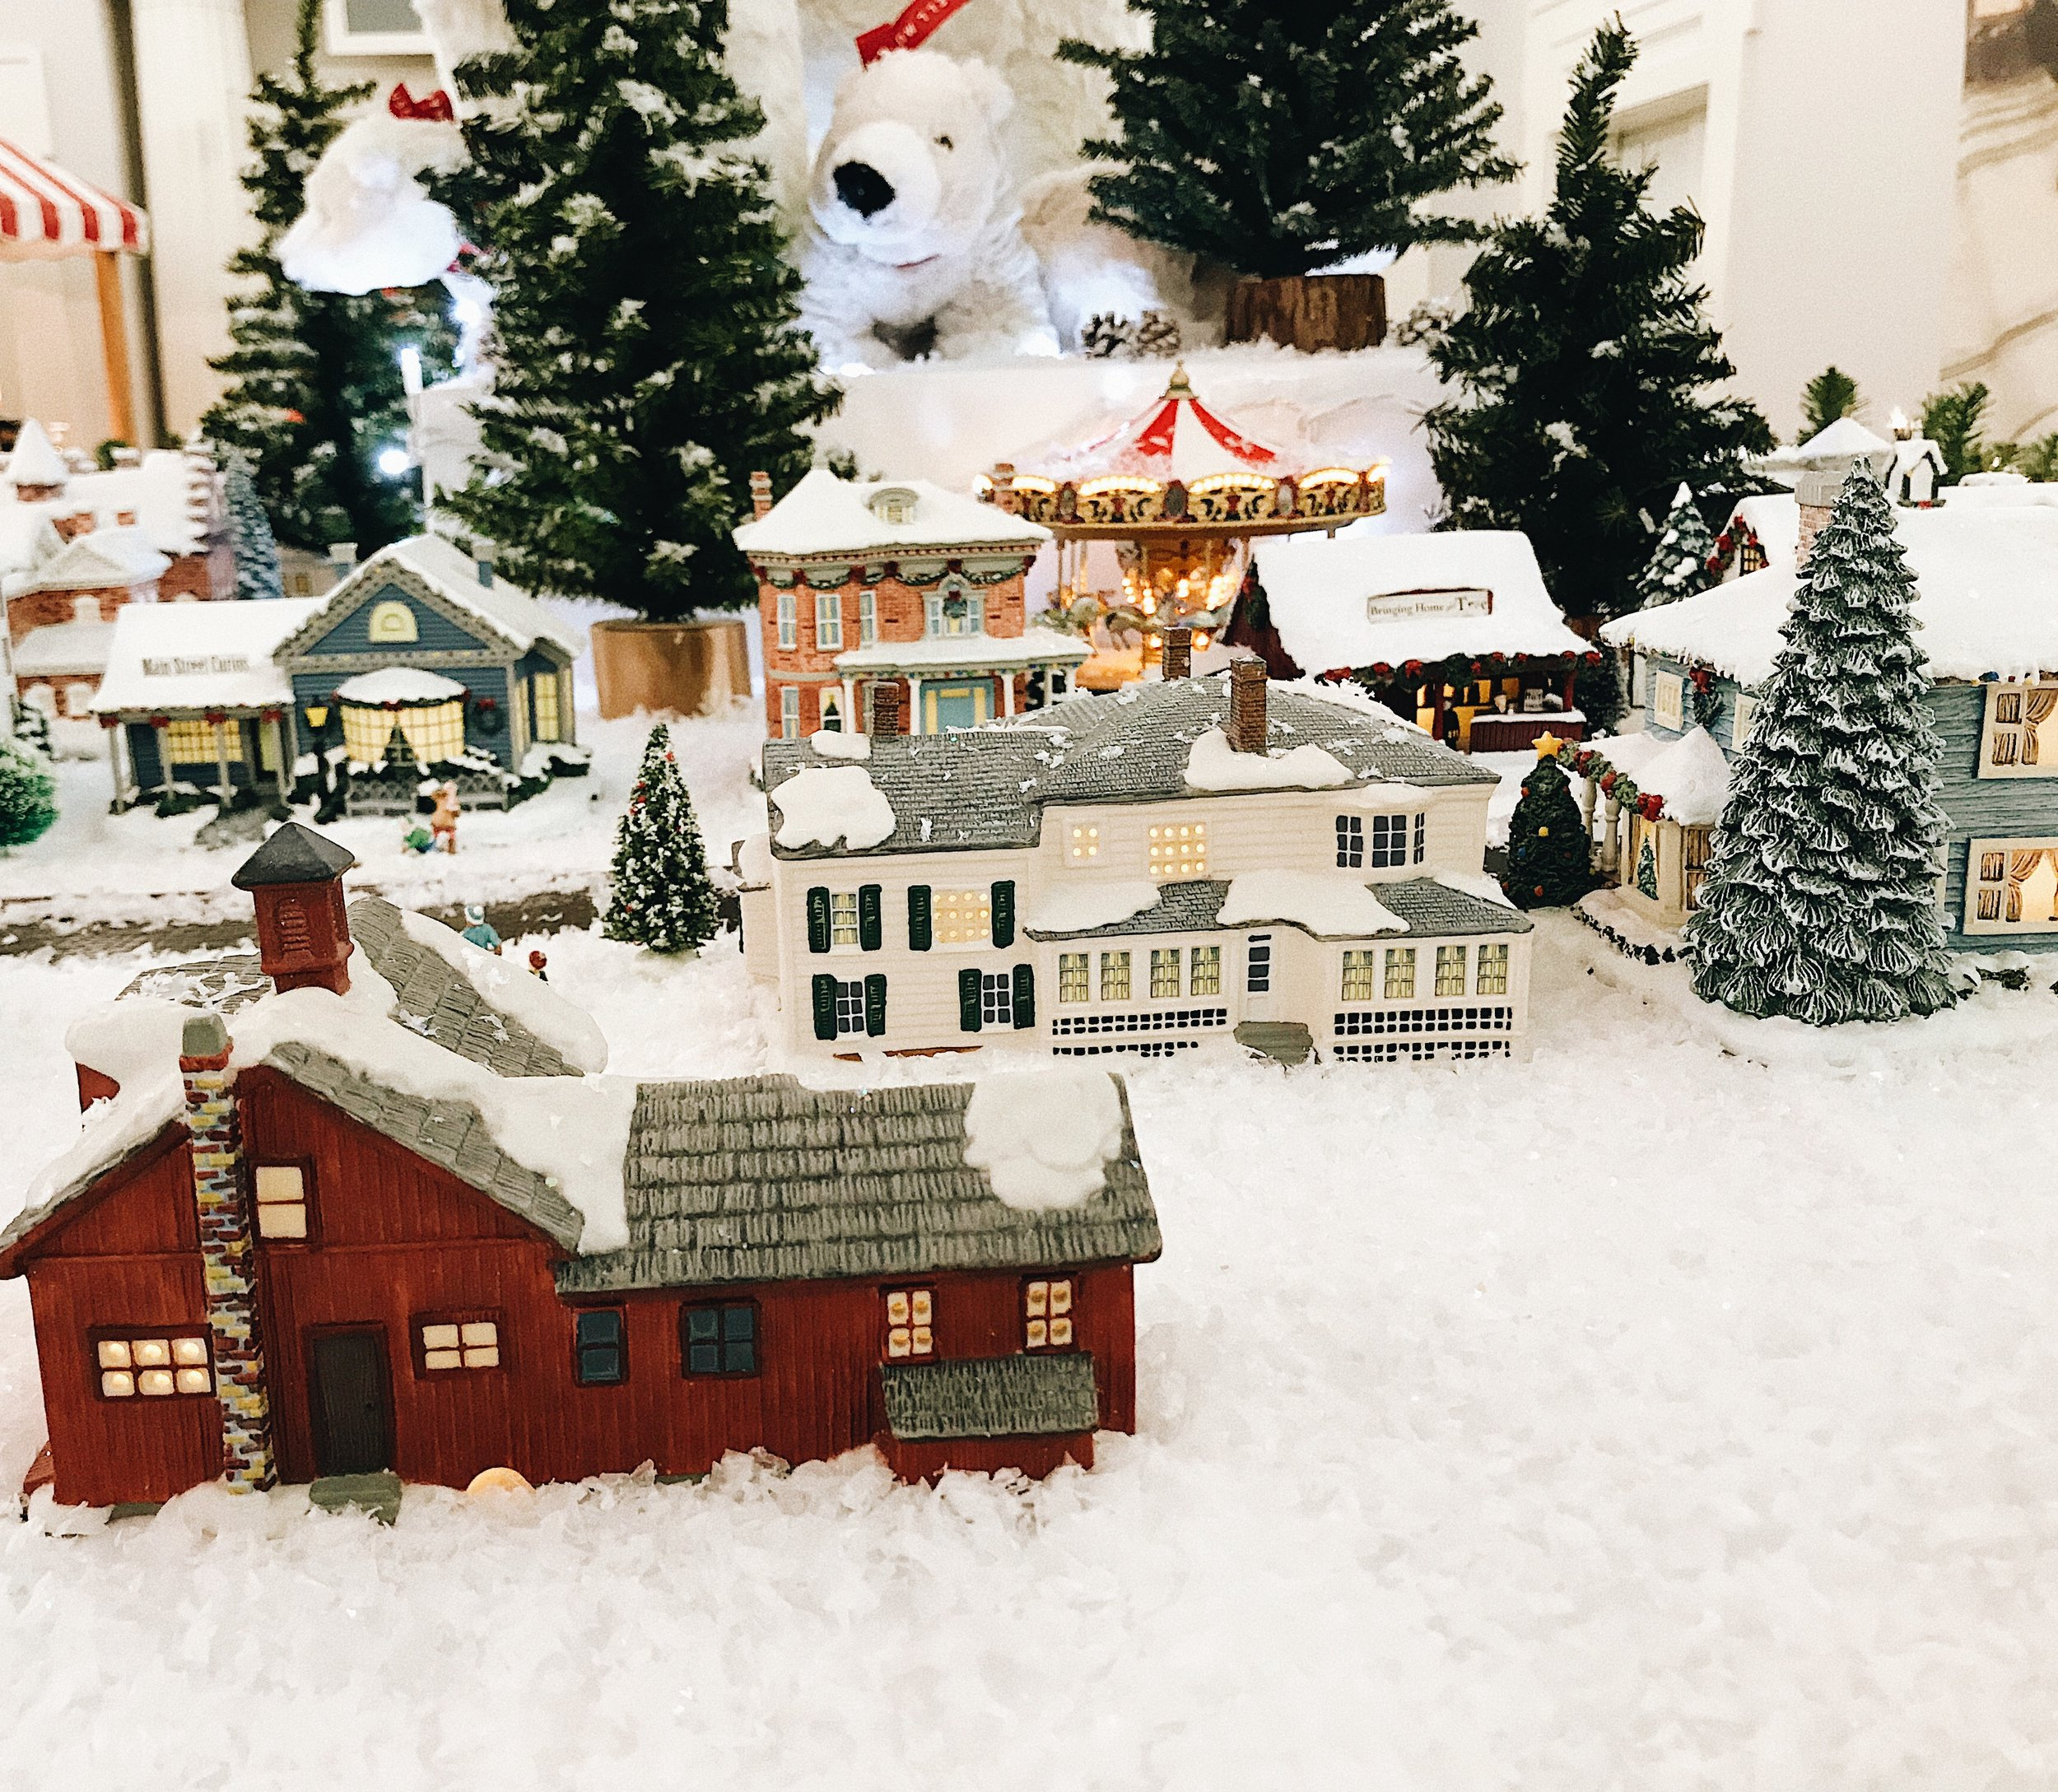 winter village in the Berkshires